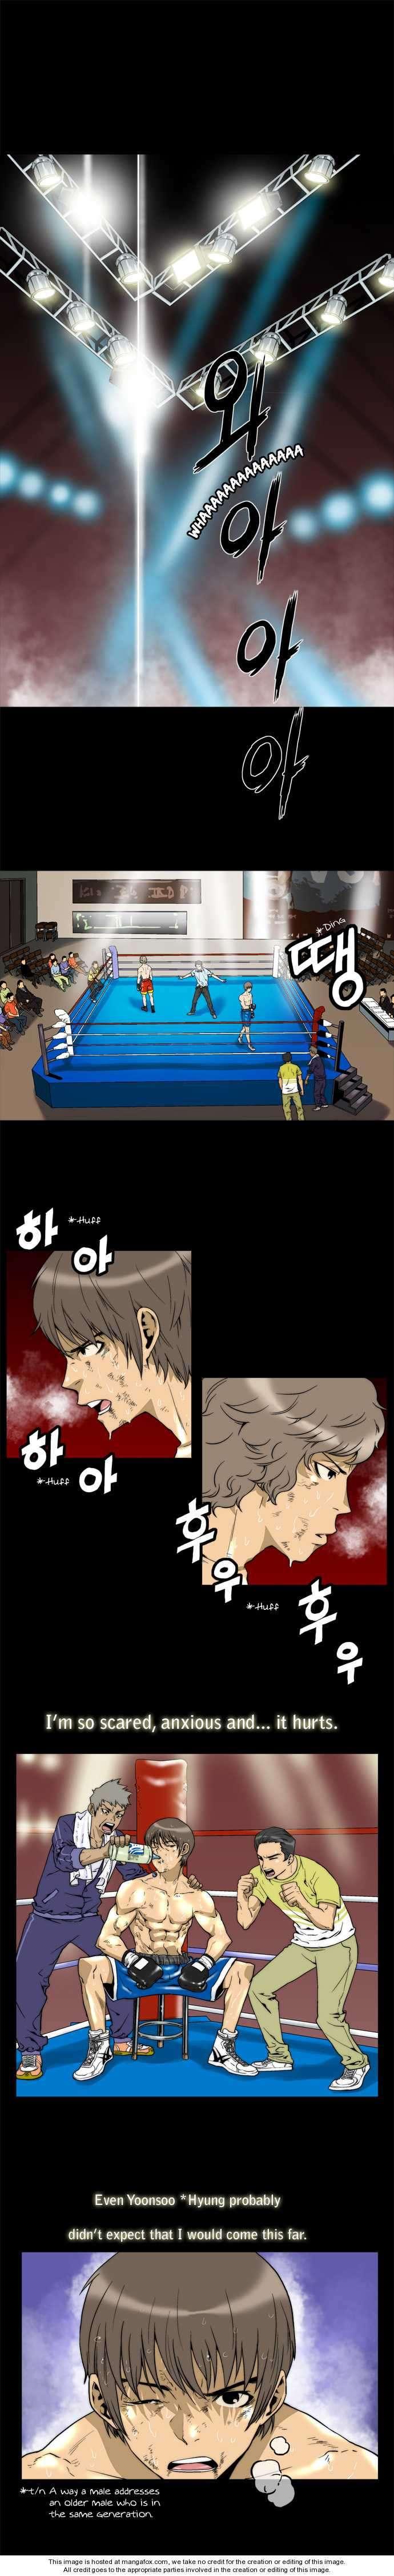 Green Boy 1.1 Page 1